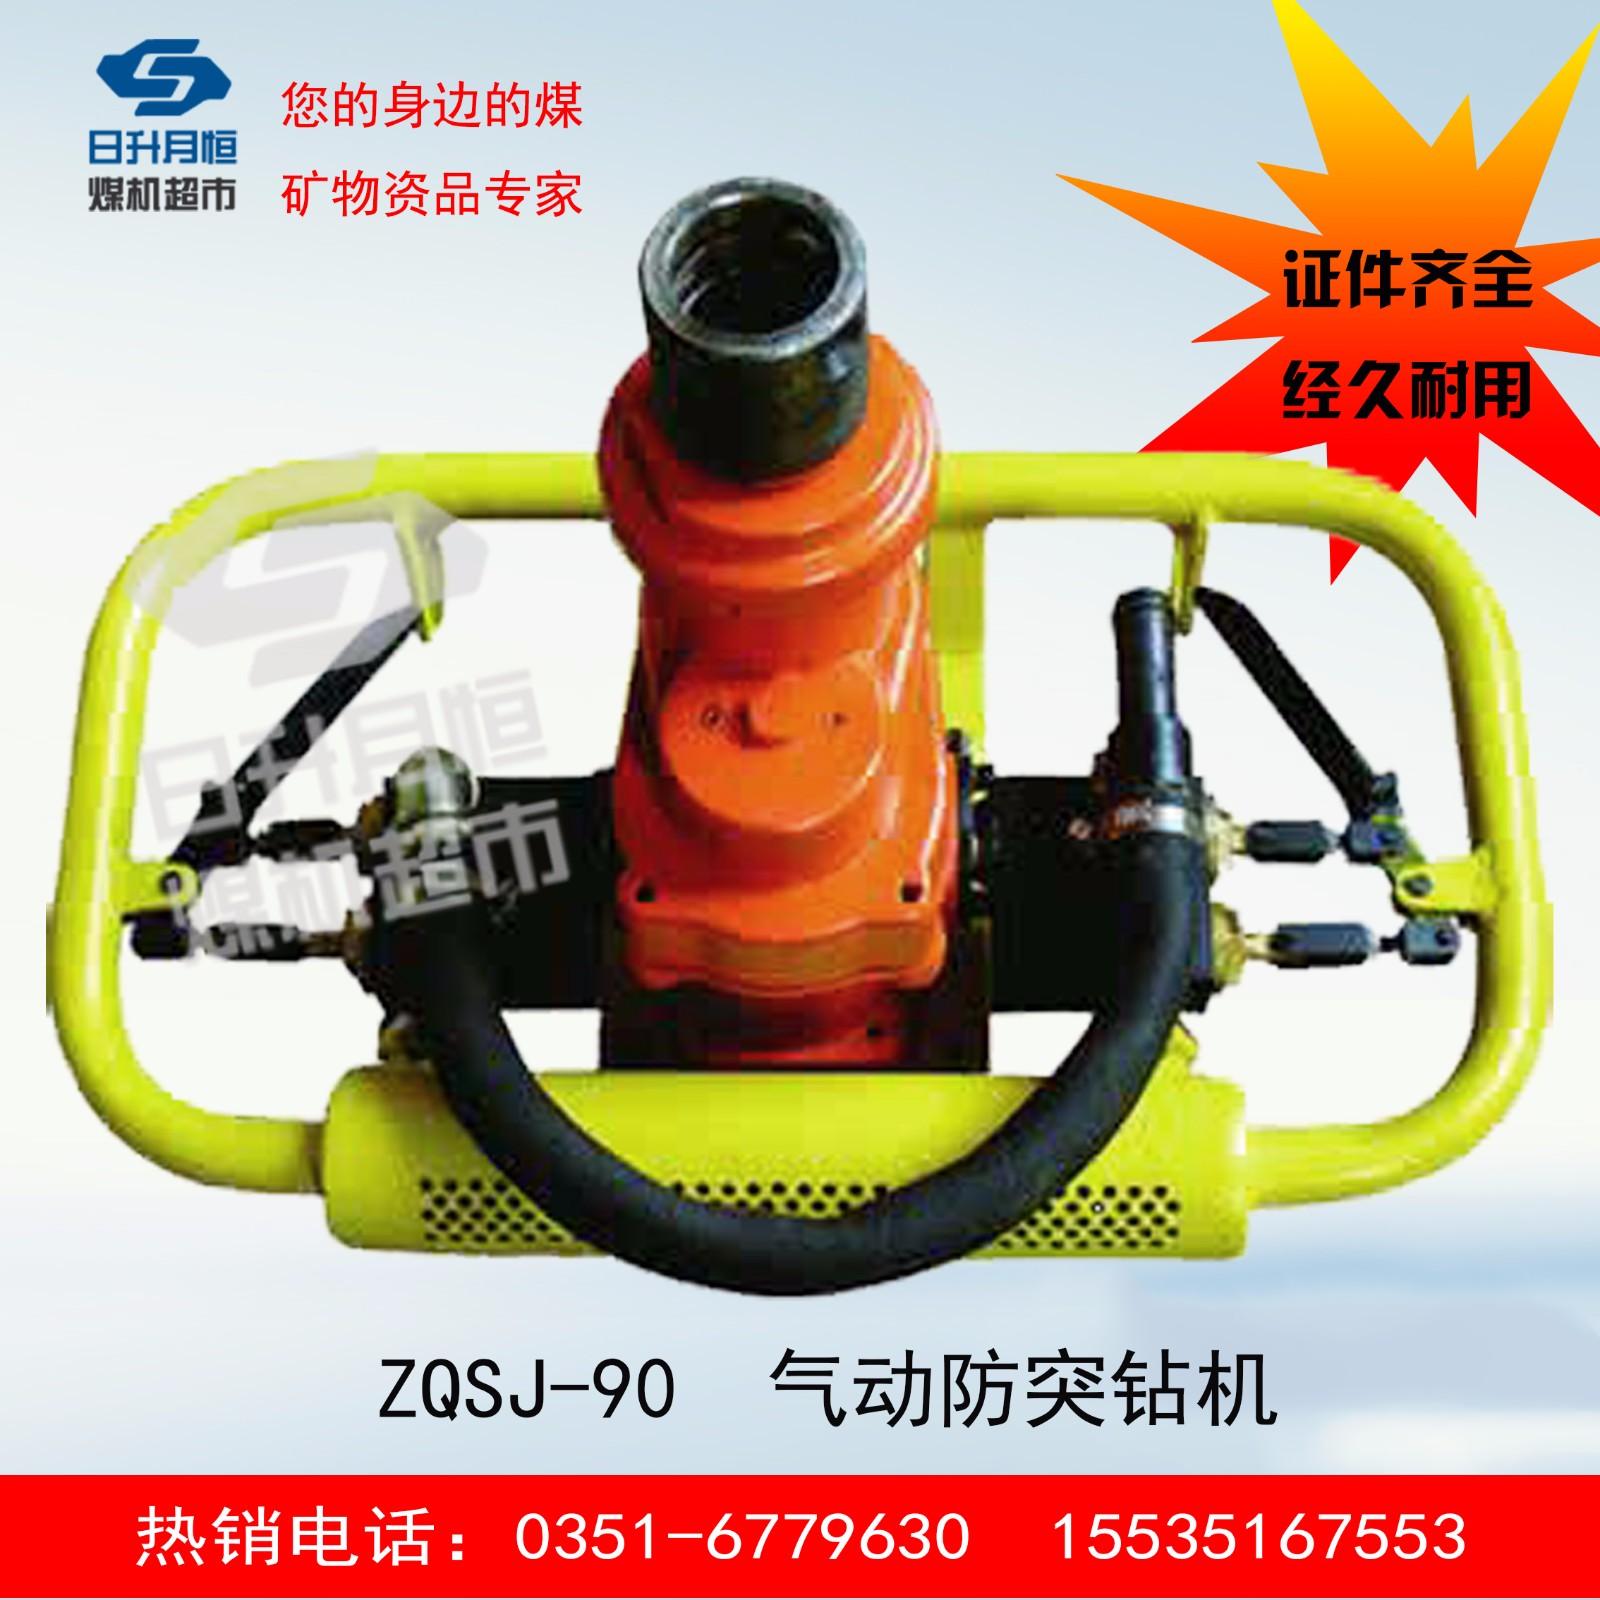 (ZQSJ-90型 架柱支撑手持气动钻机 气动防突钻机 探水钻机)山西日升月恒机电设备